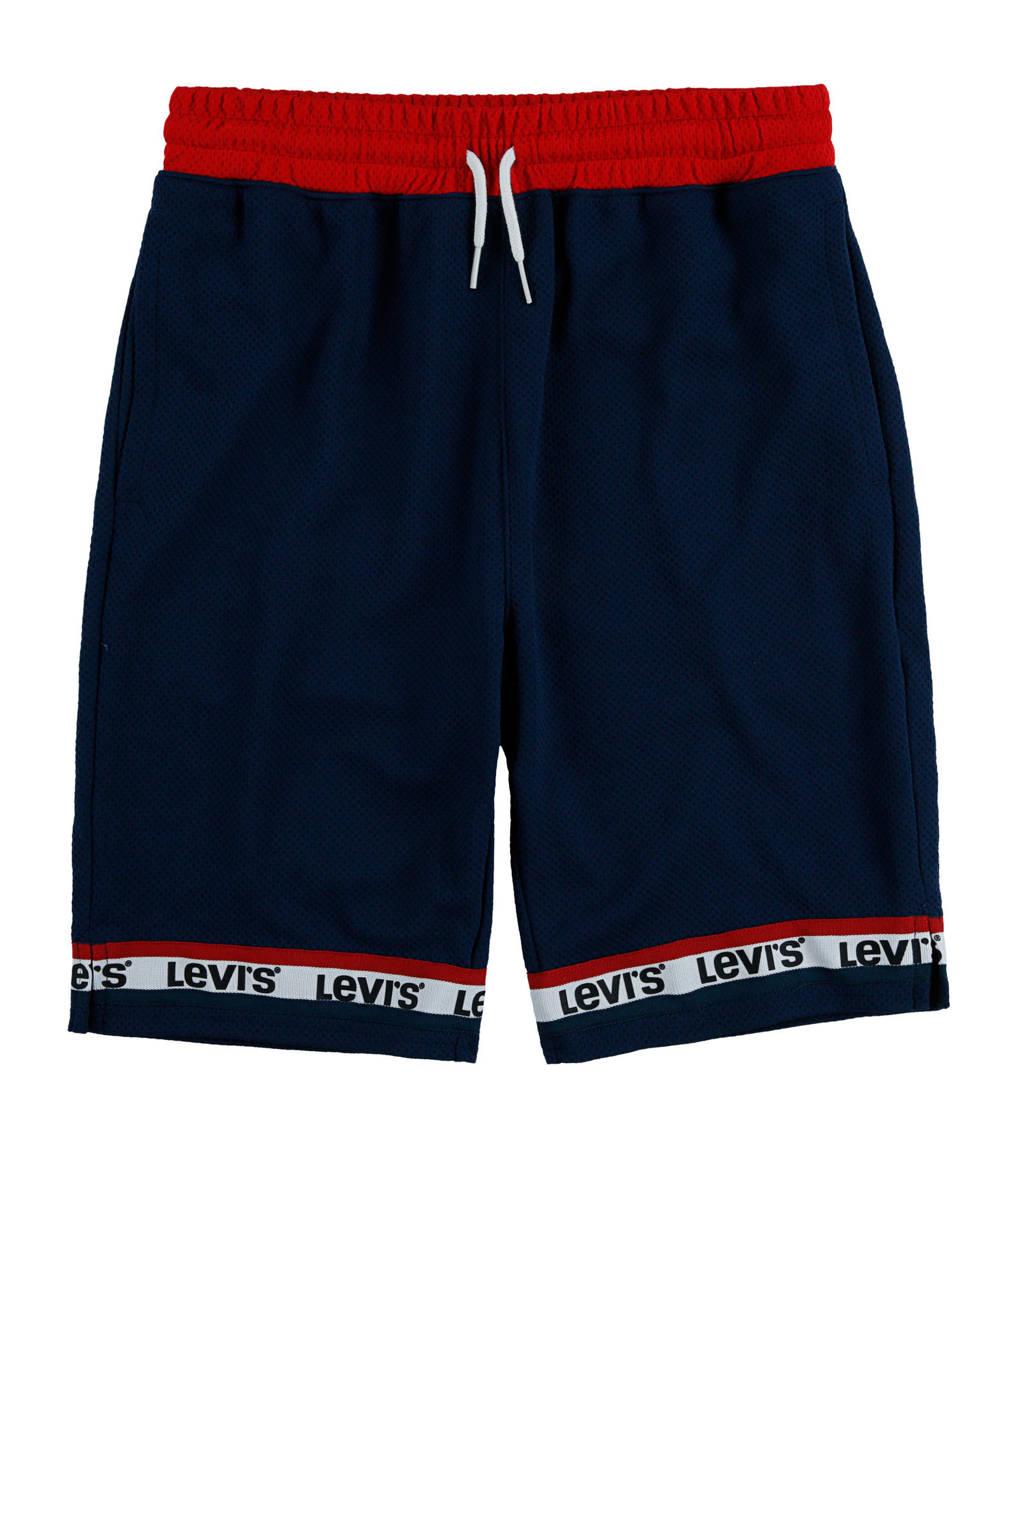 Levi's Kids short met logo donkerblauw/rood/wit, Donkerblauw/rood/wit